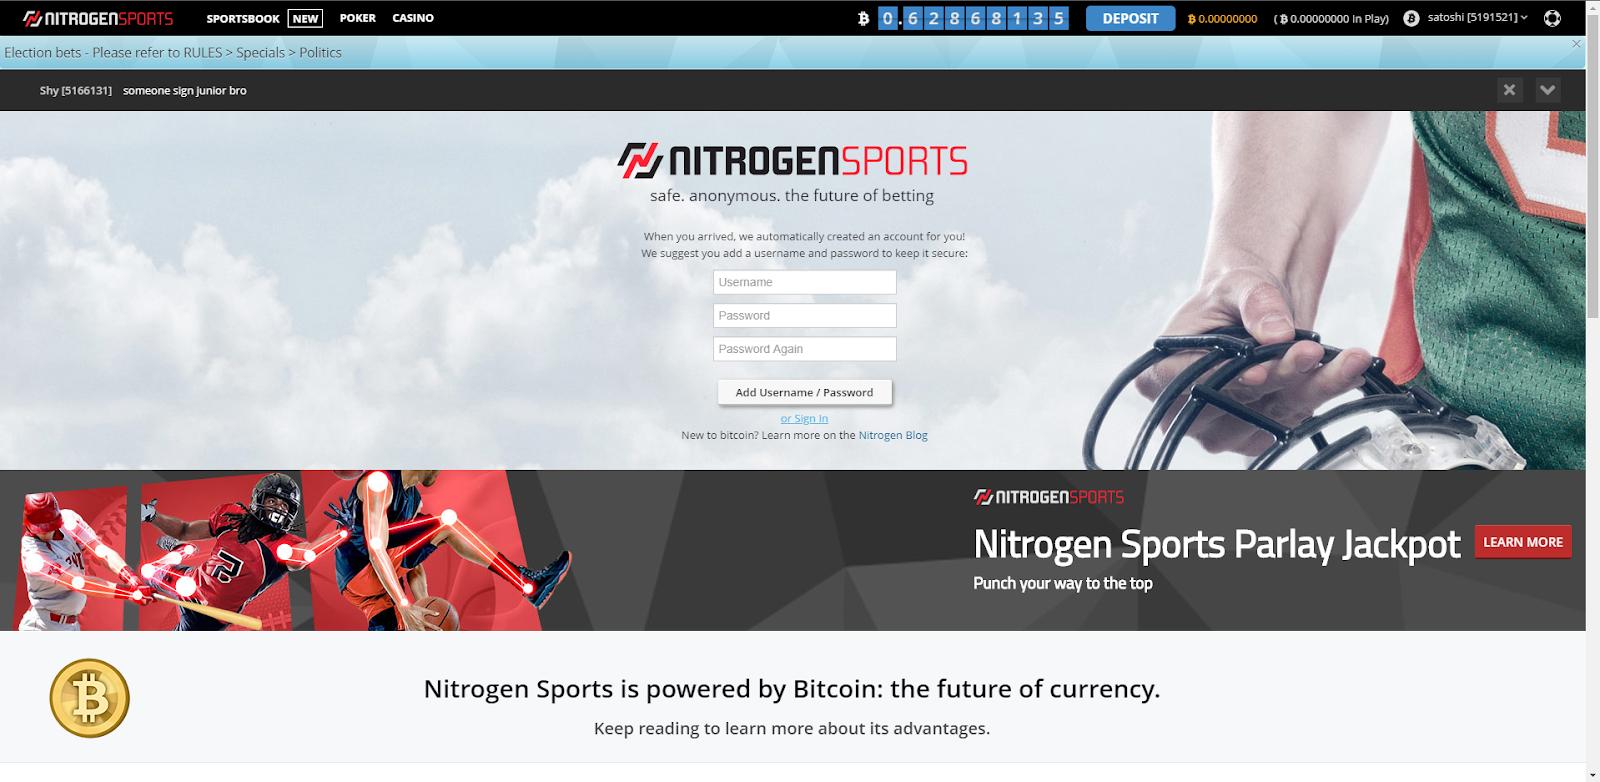 Nitrogen Sports Home